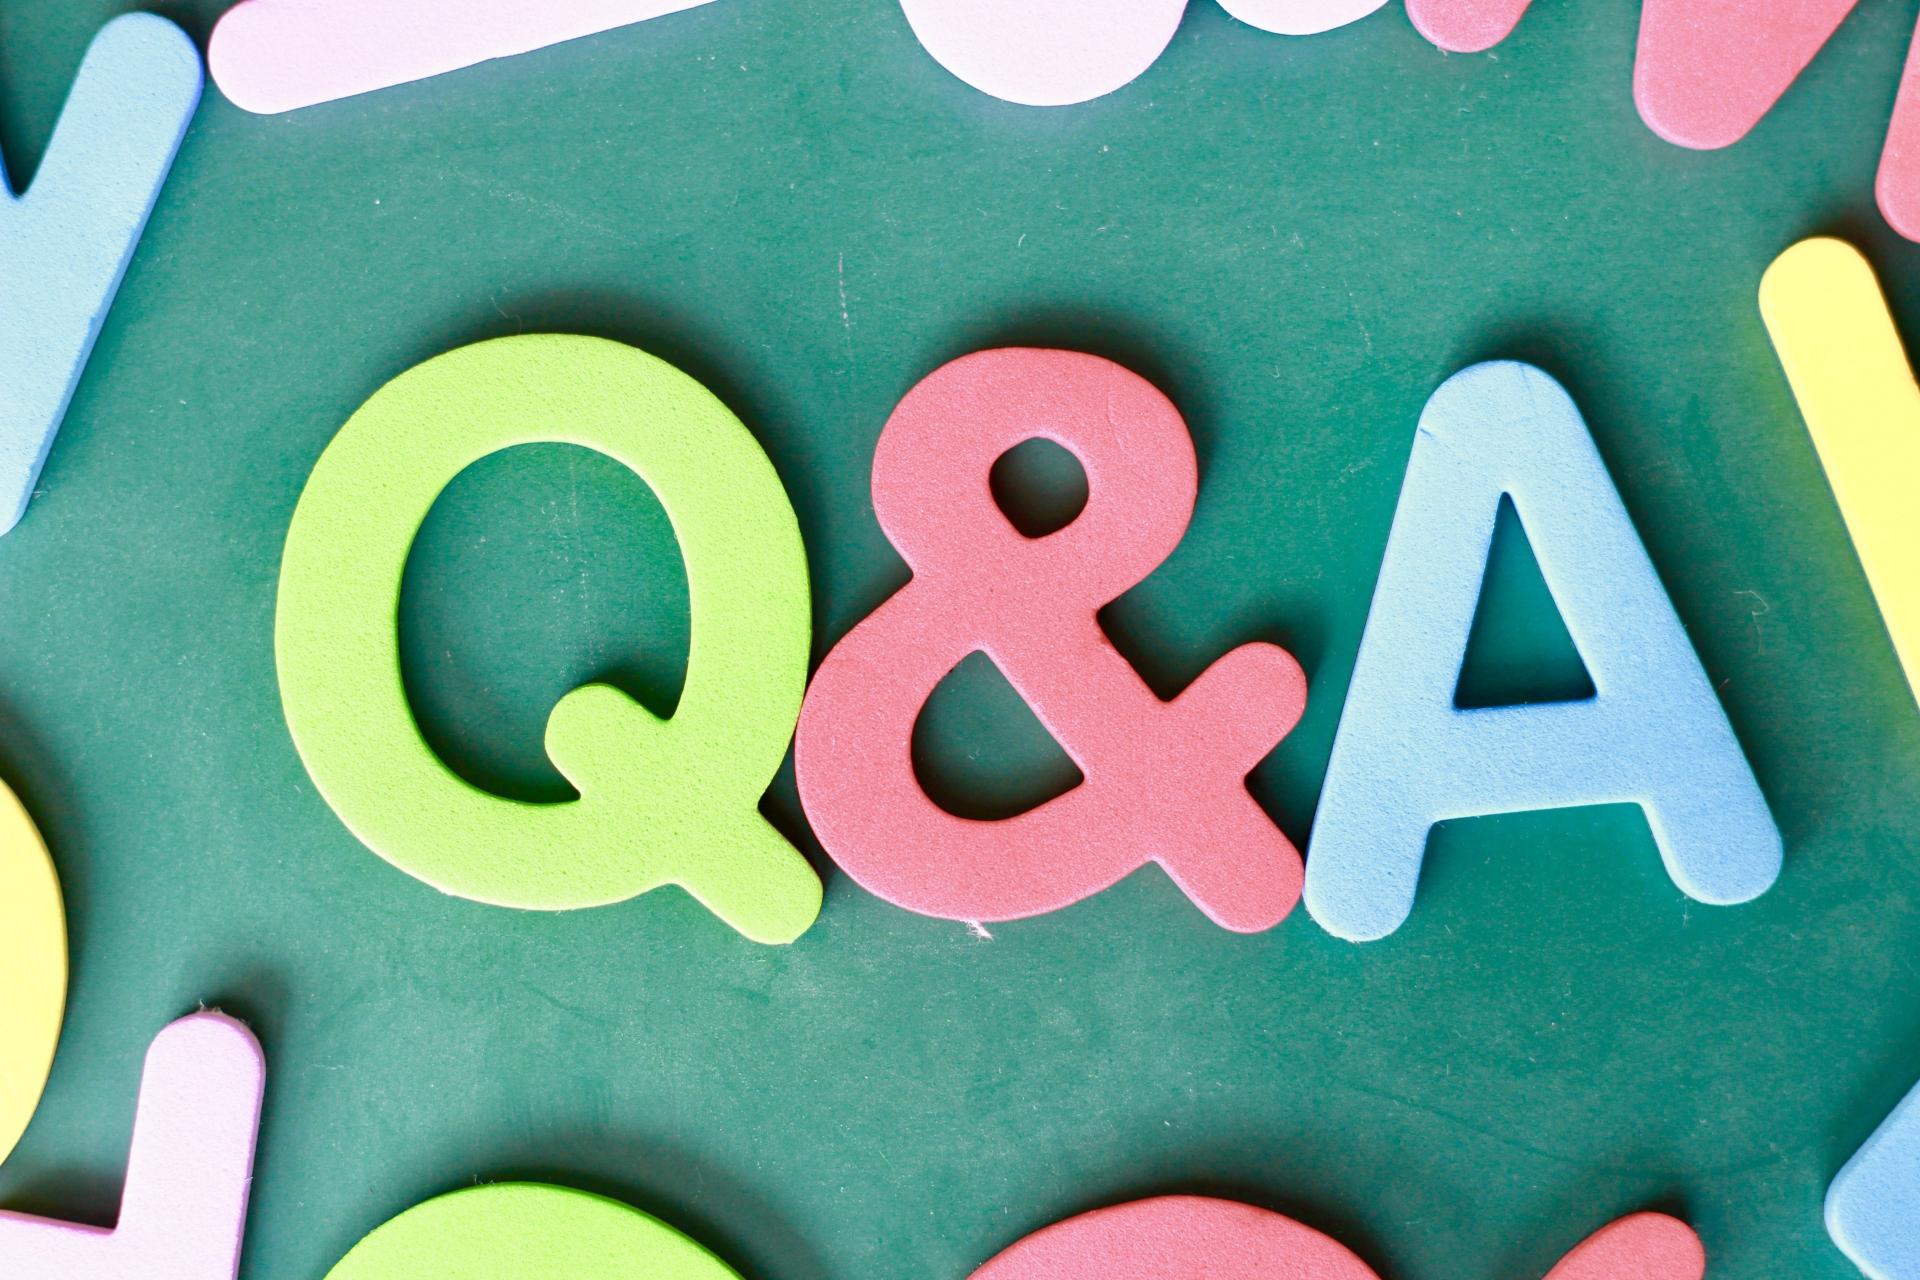 MA (マーケティングオートメーション)の導入と運用でよくある質問と回答について